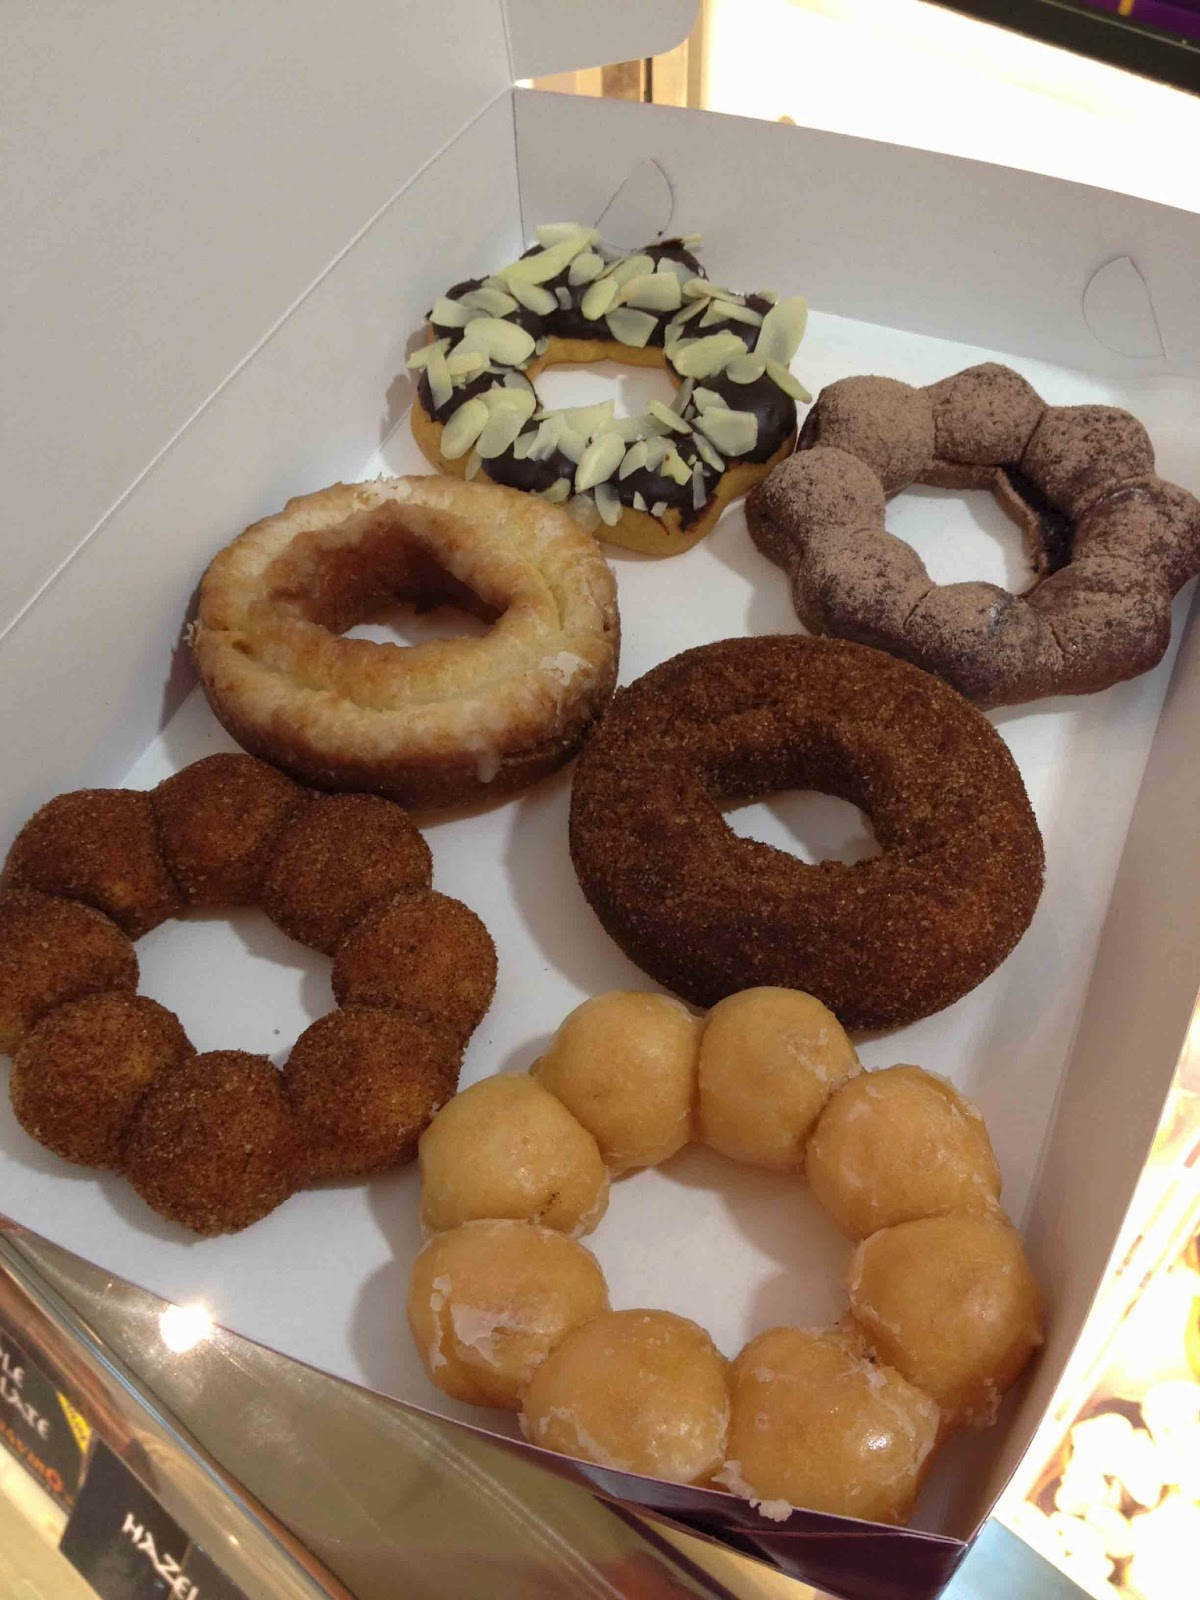 trigger happy foodie: Gavino's Japanese Donuts